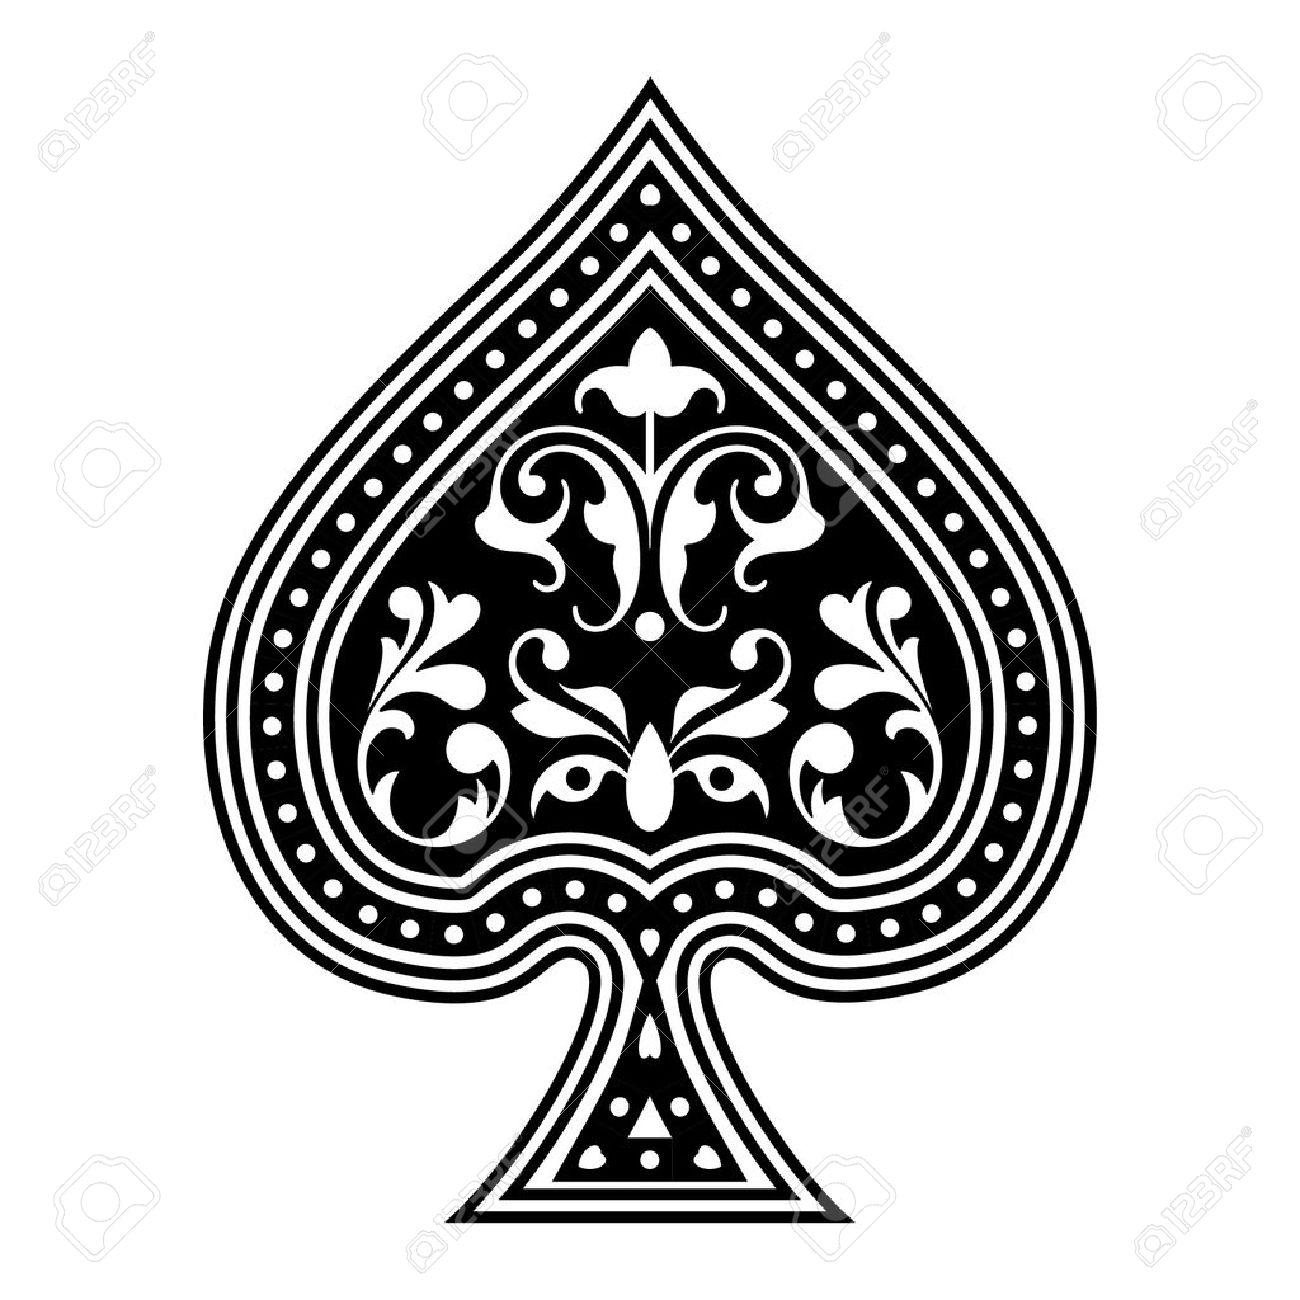 spade card vector  An ornate playing card spade